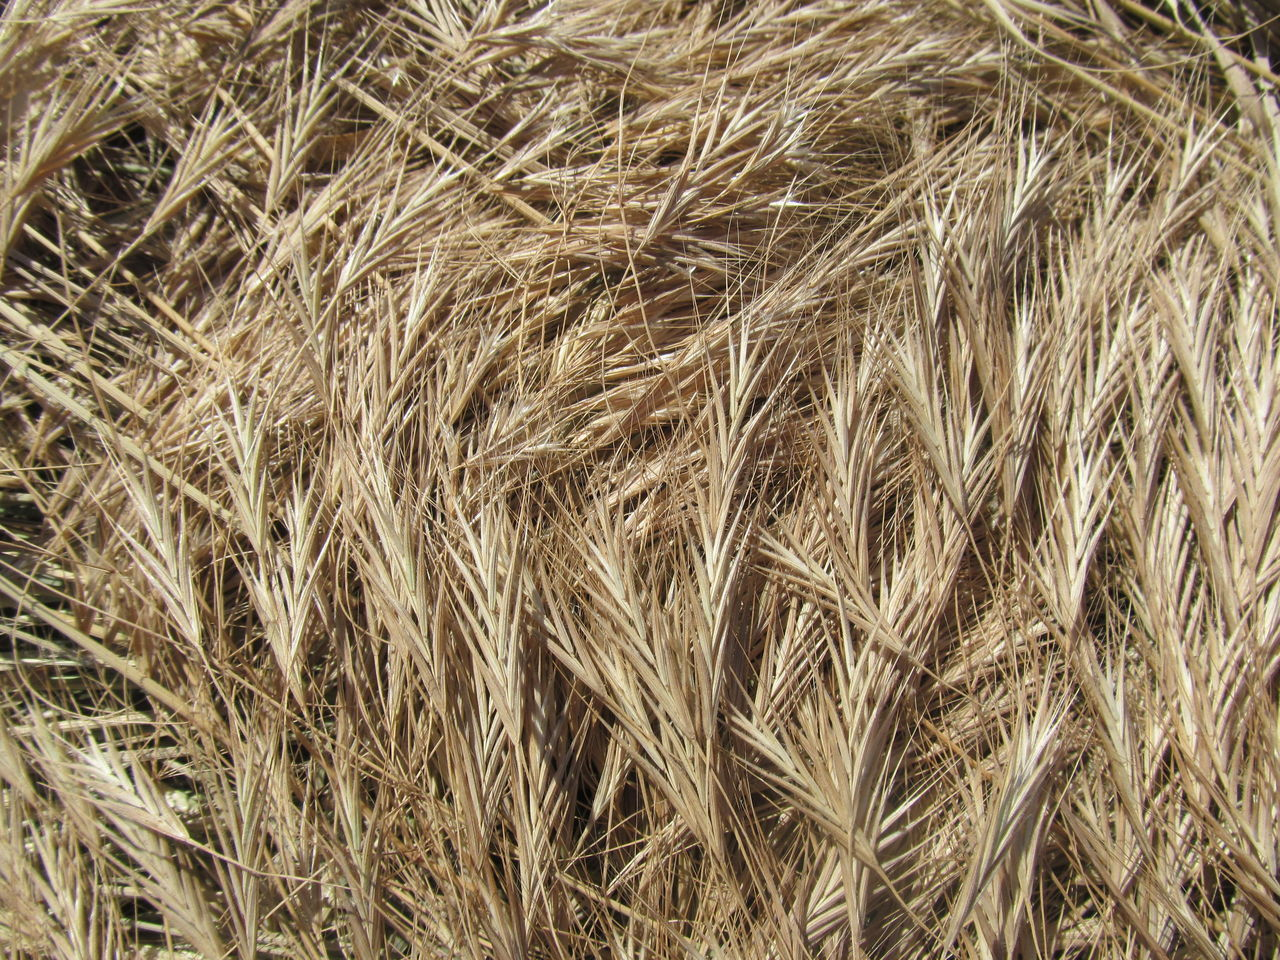 View Of Crop In Field